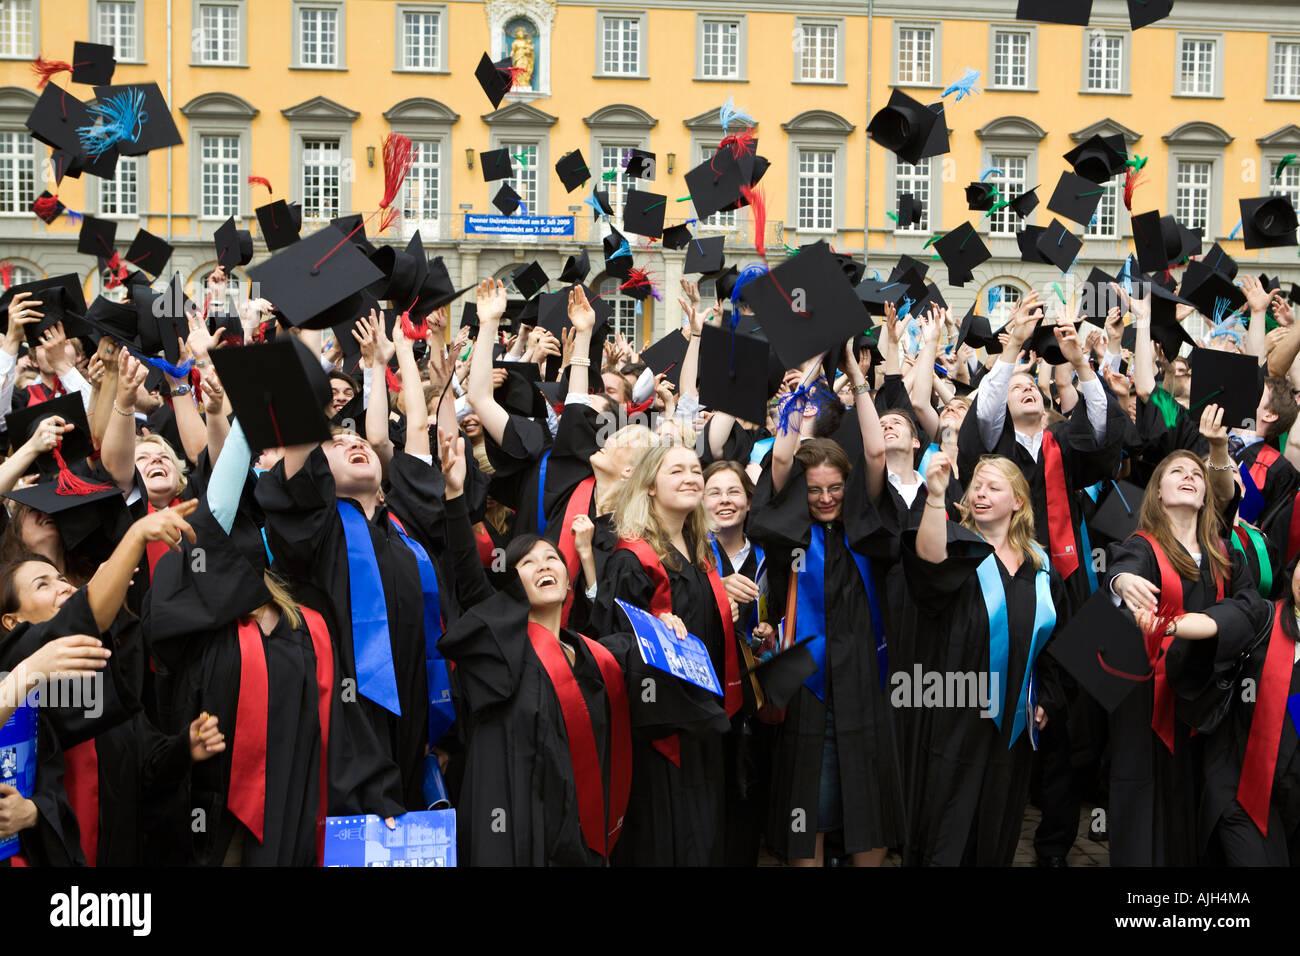 Throwing Bachelor Cap Stockfotos & Throwing Bachelor Cap Bilder - Alamy